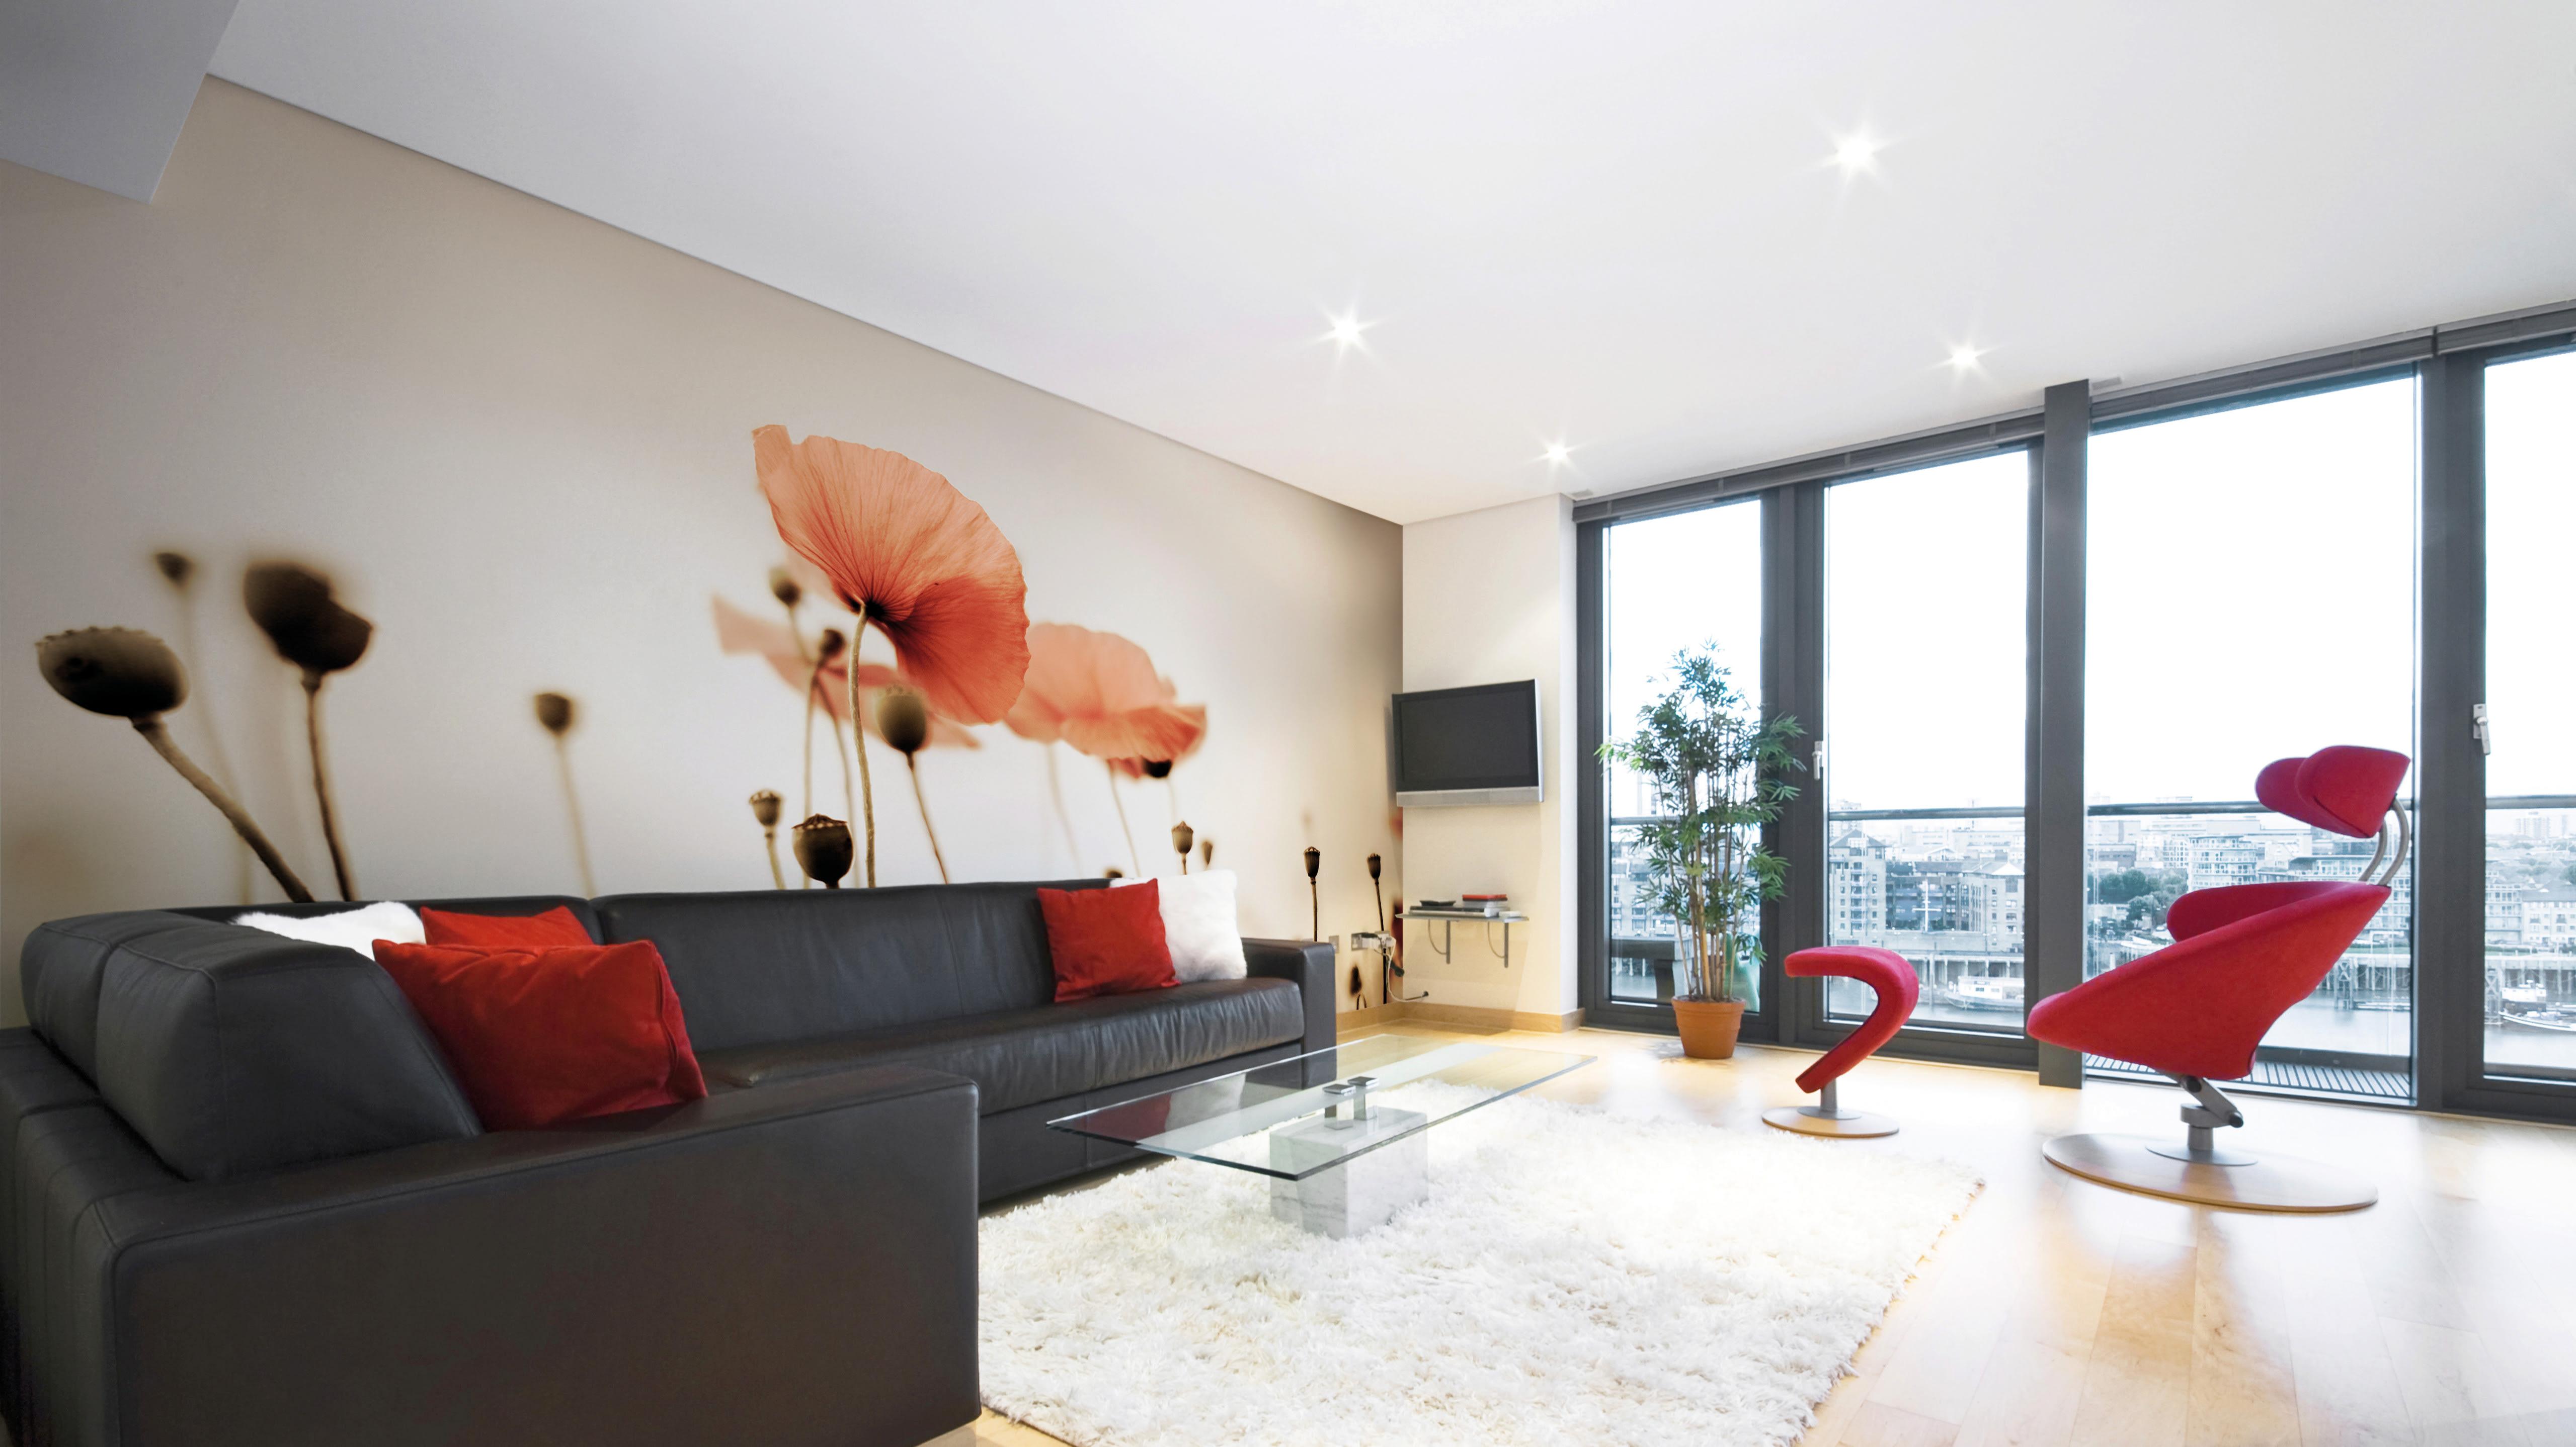 Spannwand Mohnblume Wohnzimmer mit rotem Sessel